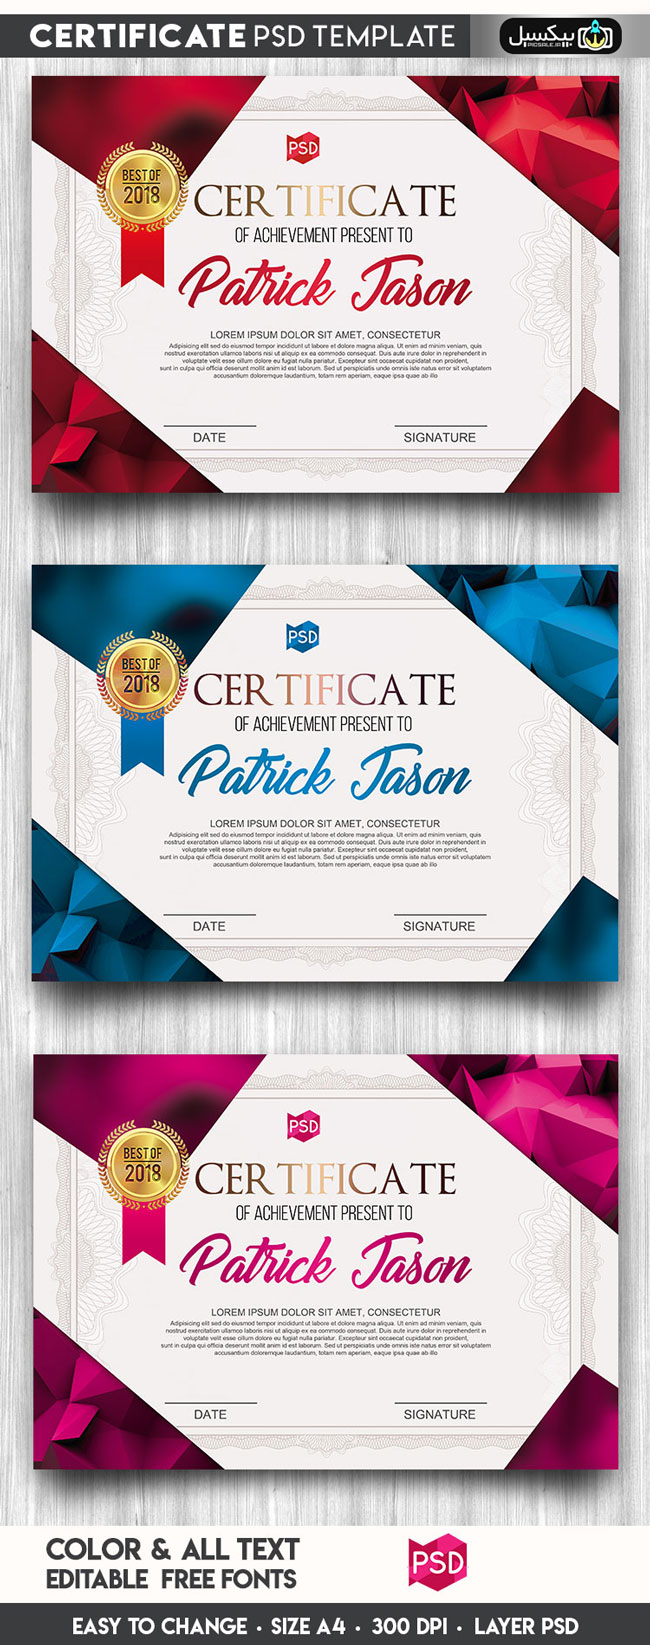 p427 - لایه باز گواهینامه همایش، سمینار و گواهینامه دوره آموزشی یا آکادمی خلاقانه